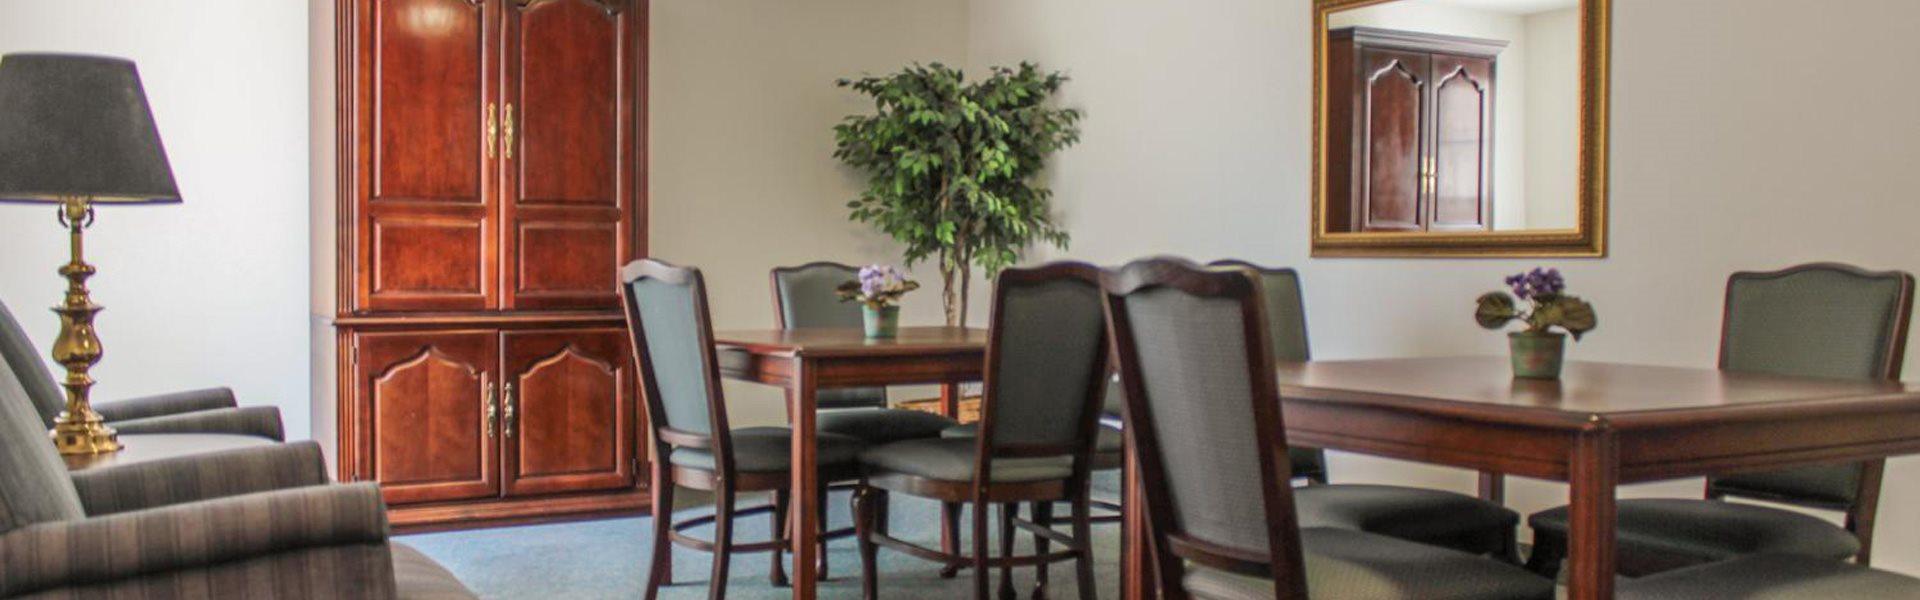 Santa Clarita, CA | Bouquet Canyon Senior Apartments For Rent